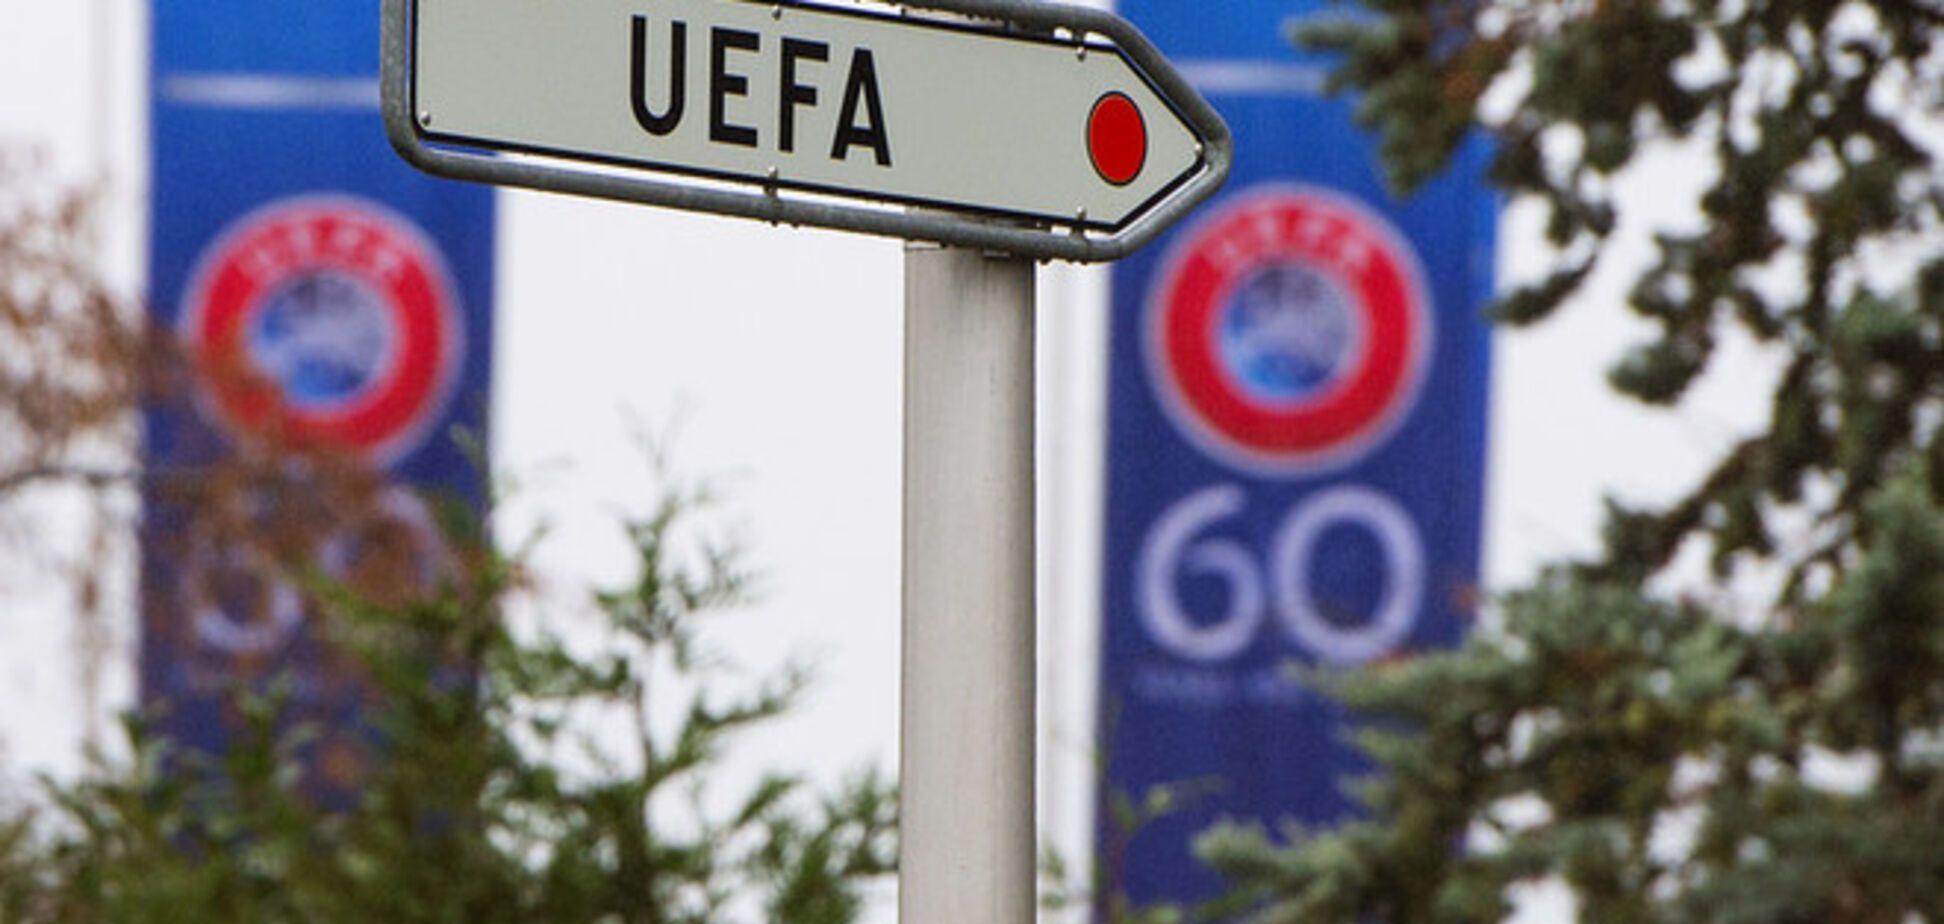 УЄФА зробить в Криму спеціальну футбольну зону